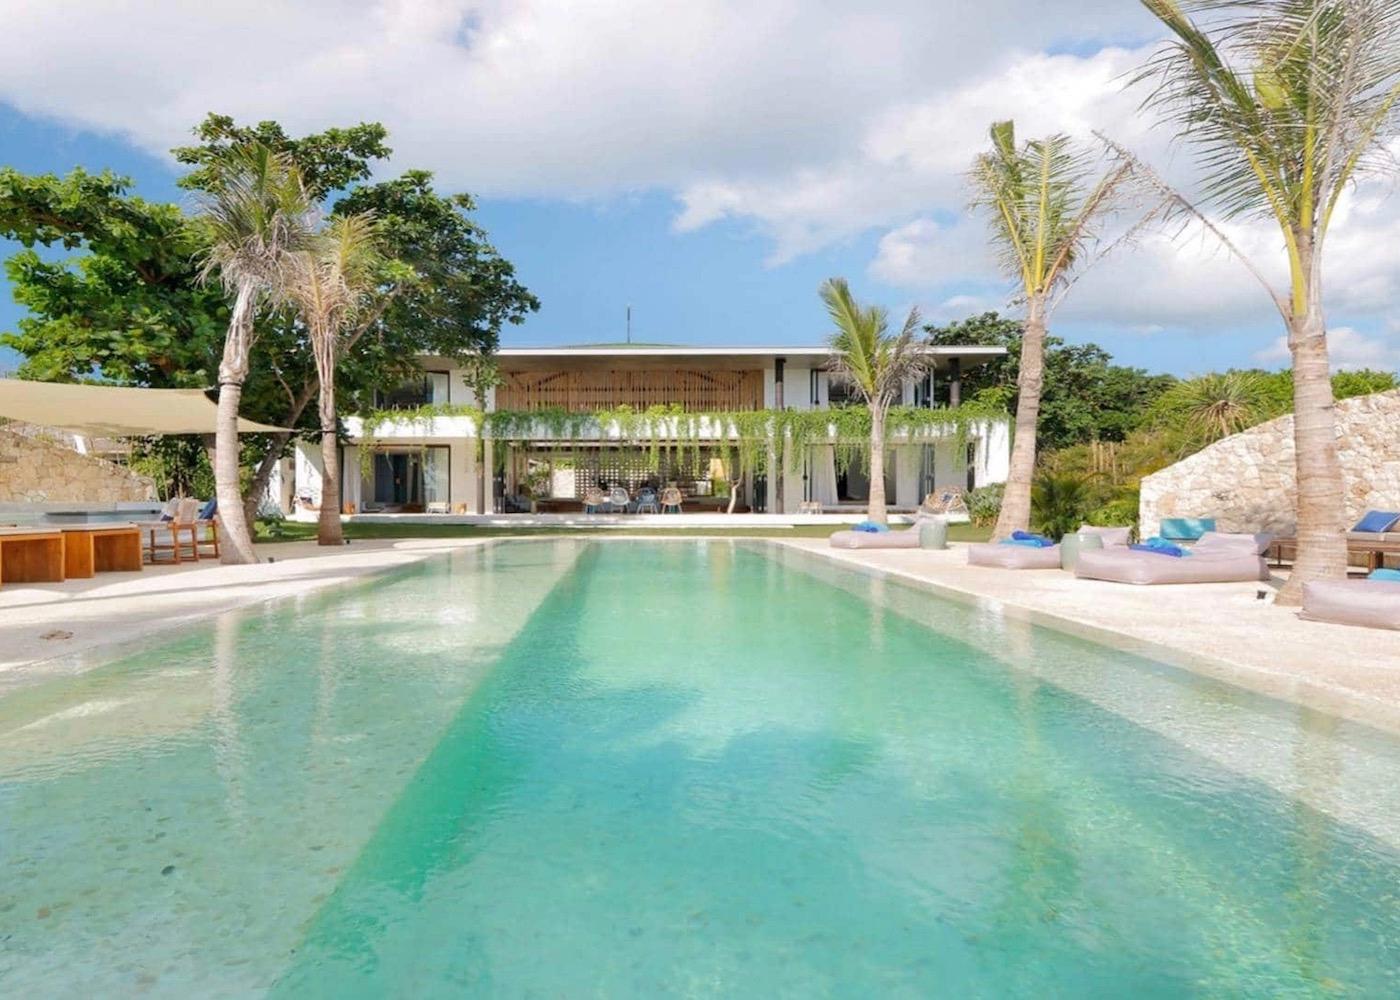 Villa Seascape on Nusa Lembongan island in Bali, Indonesia